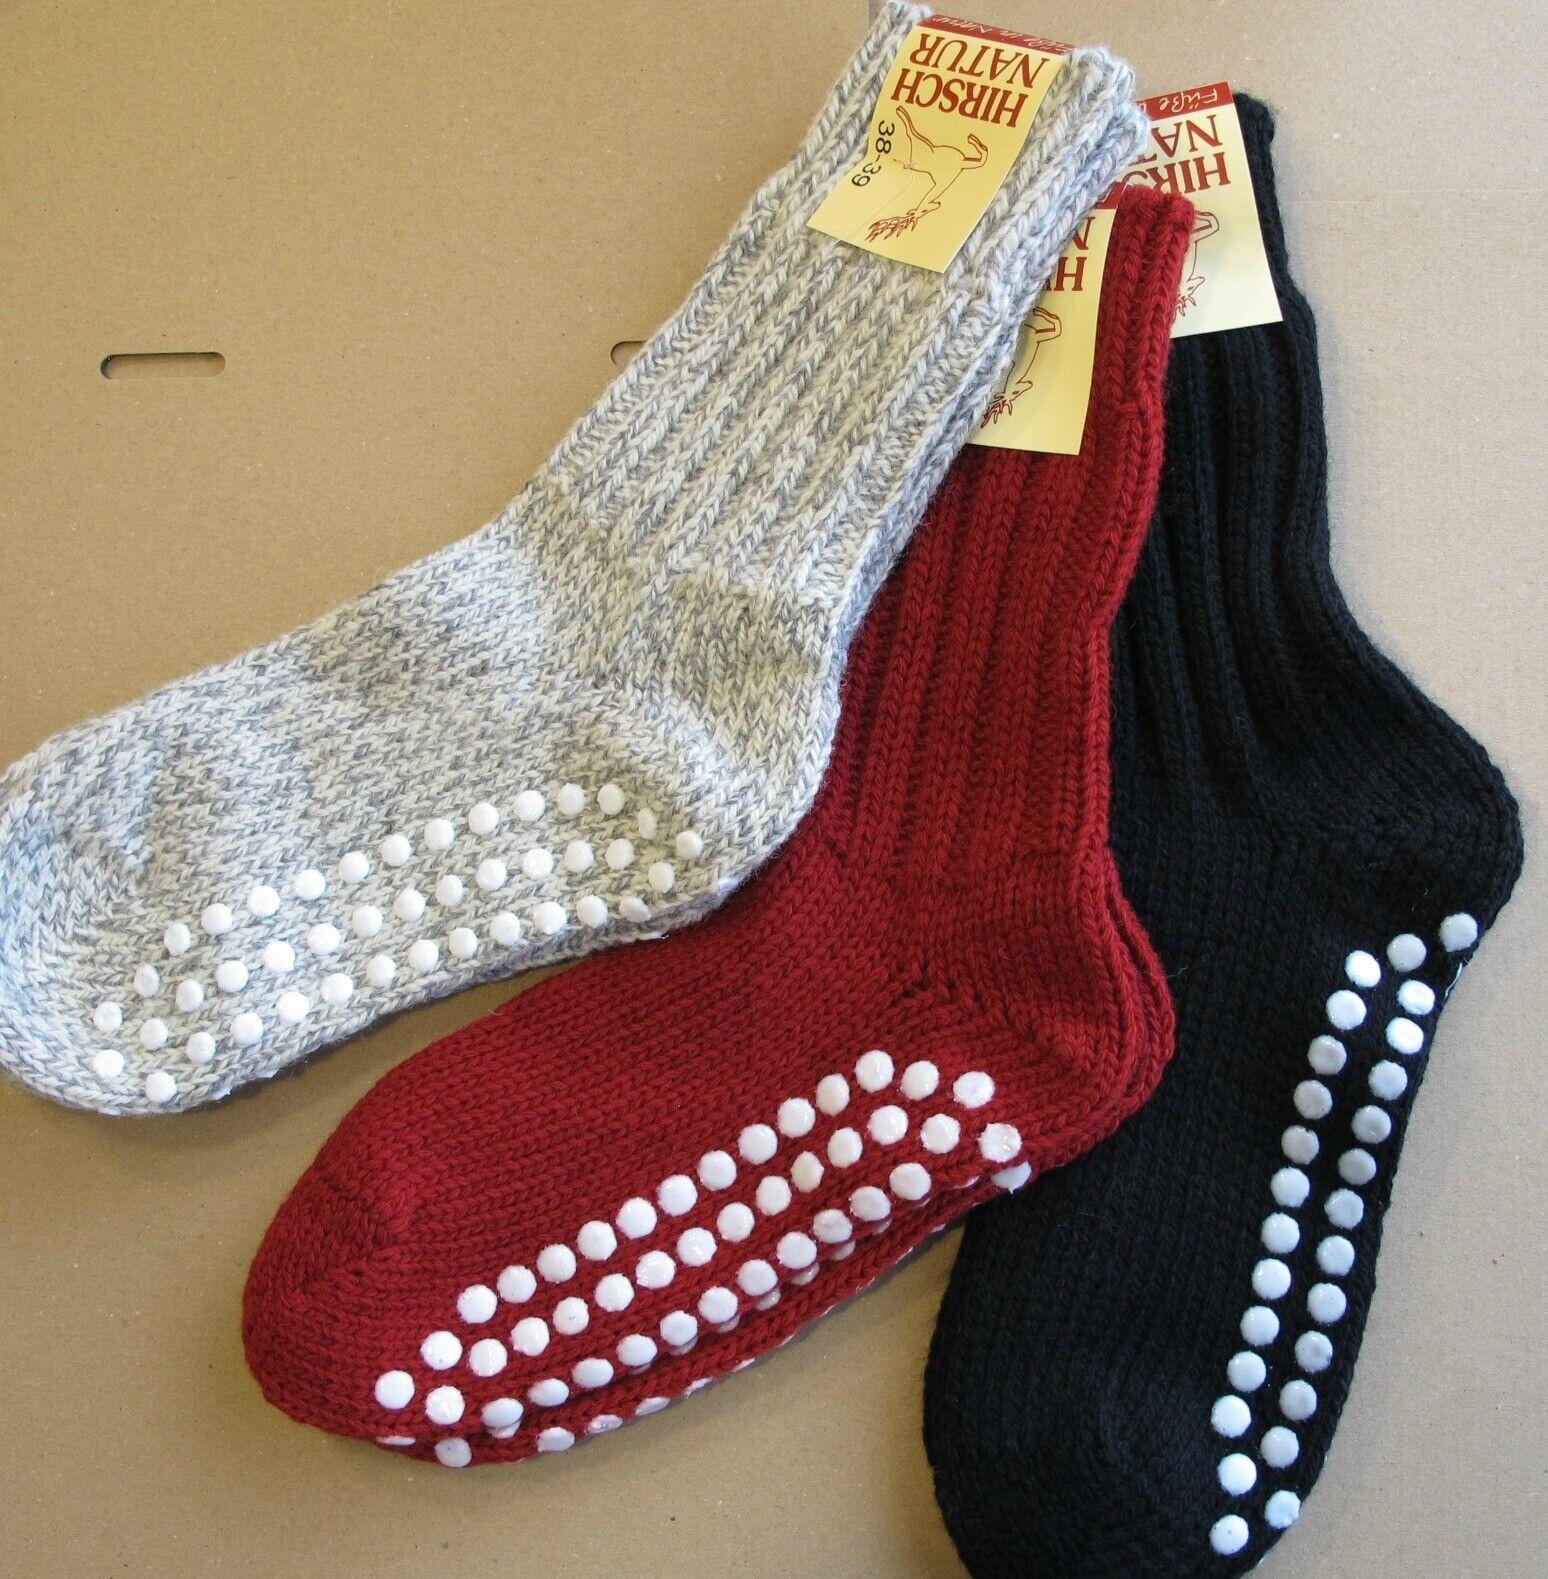 HIRSCH Stoppersocken Schurwolle Damen Herren Anti-Rutsch Socken Wollsocken ABS